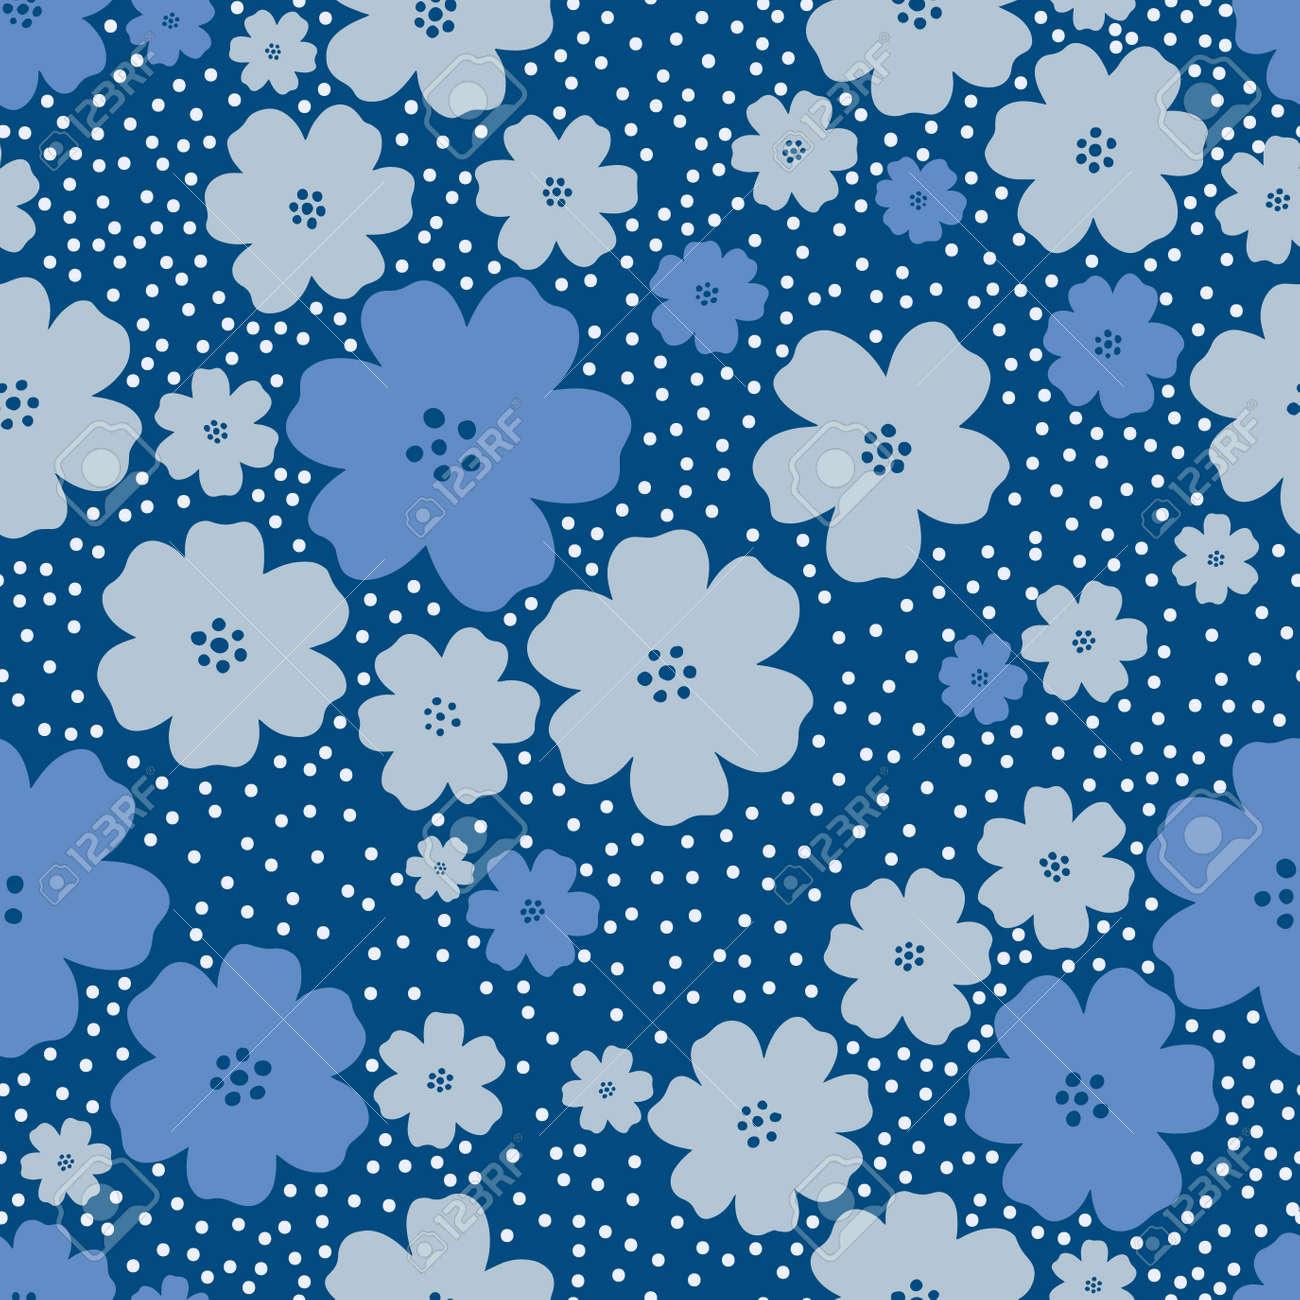 Seamless pattern flower design.Print botanical textile fabric fashion.Modern vintage style. - 170424887